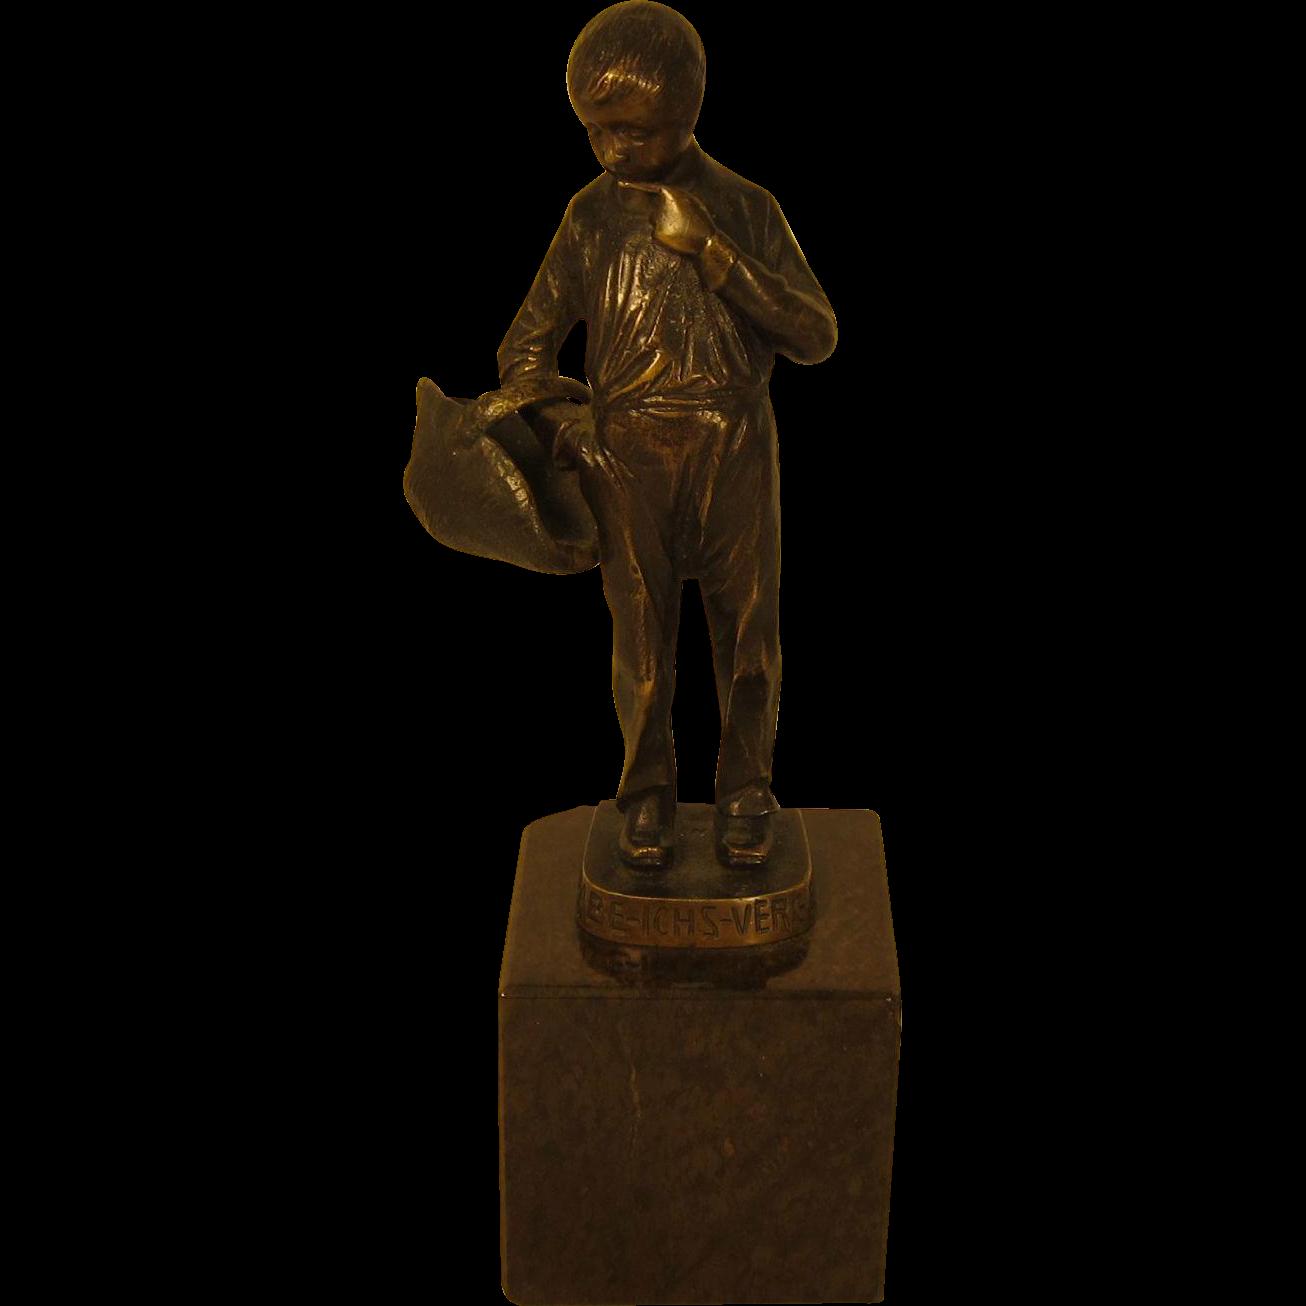 Bronze Sculpture of a Boy with a Basket by Ernst Beck (German, 1879-1941)